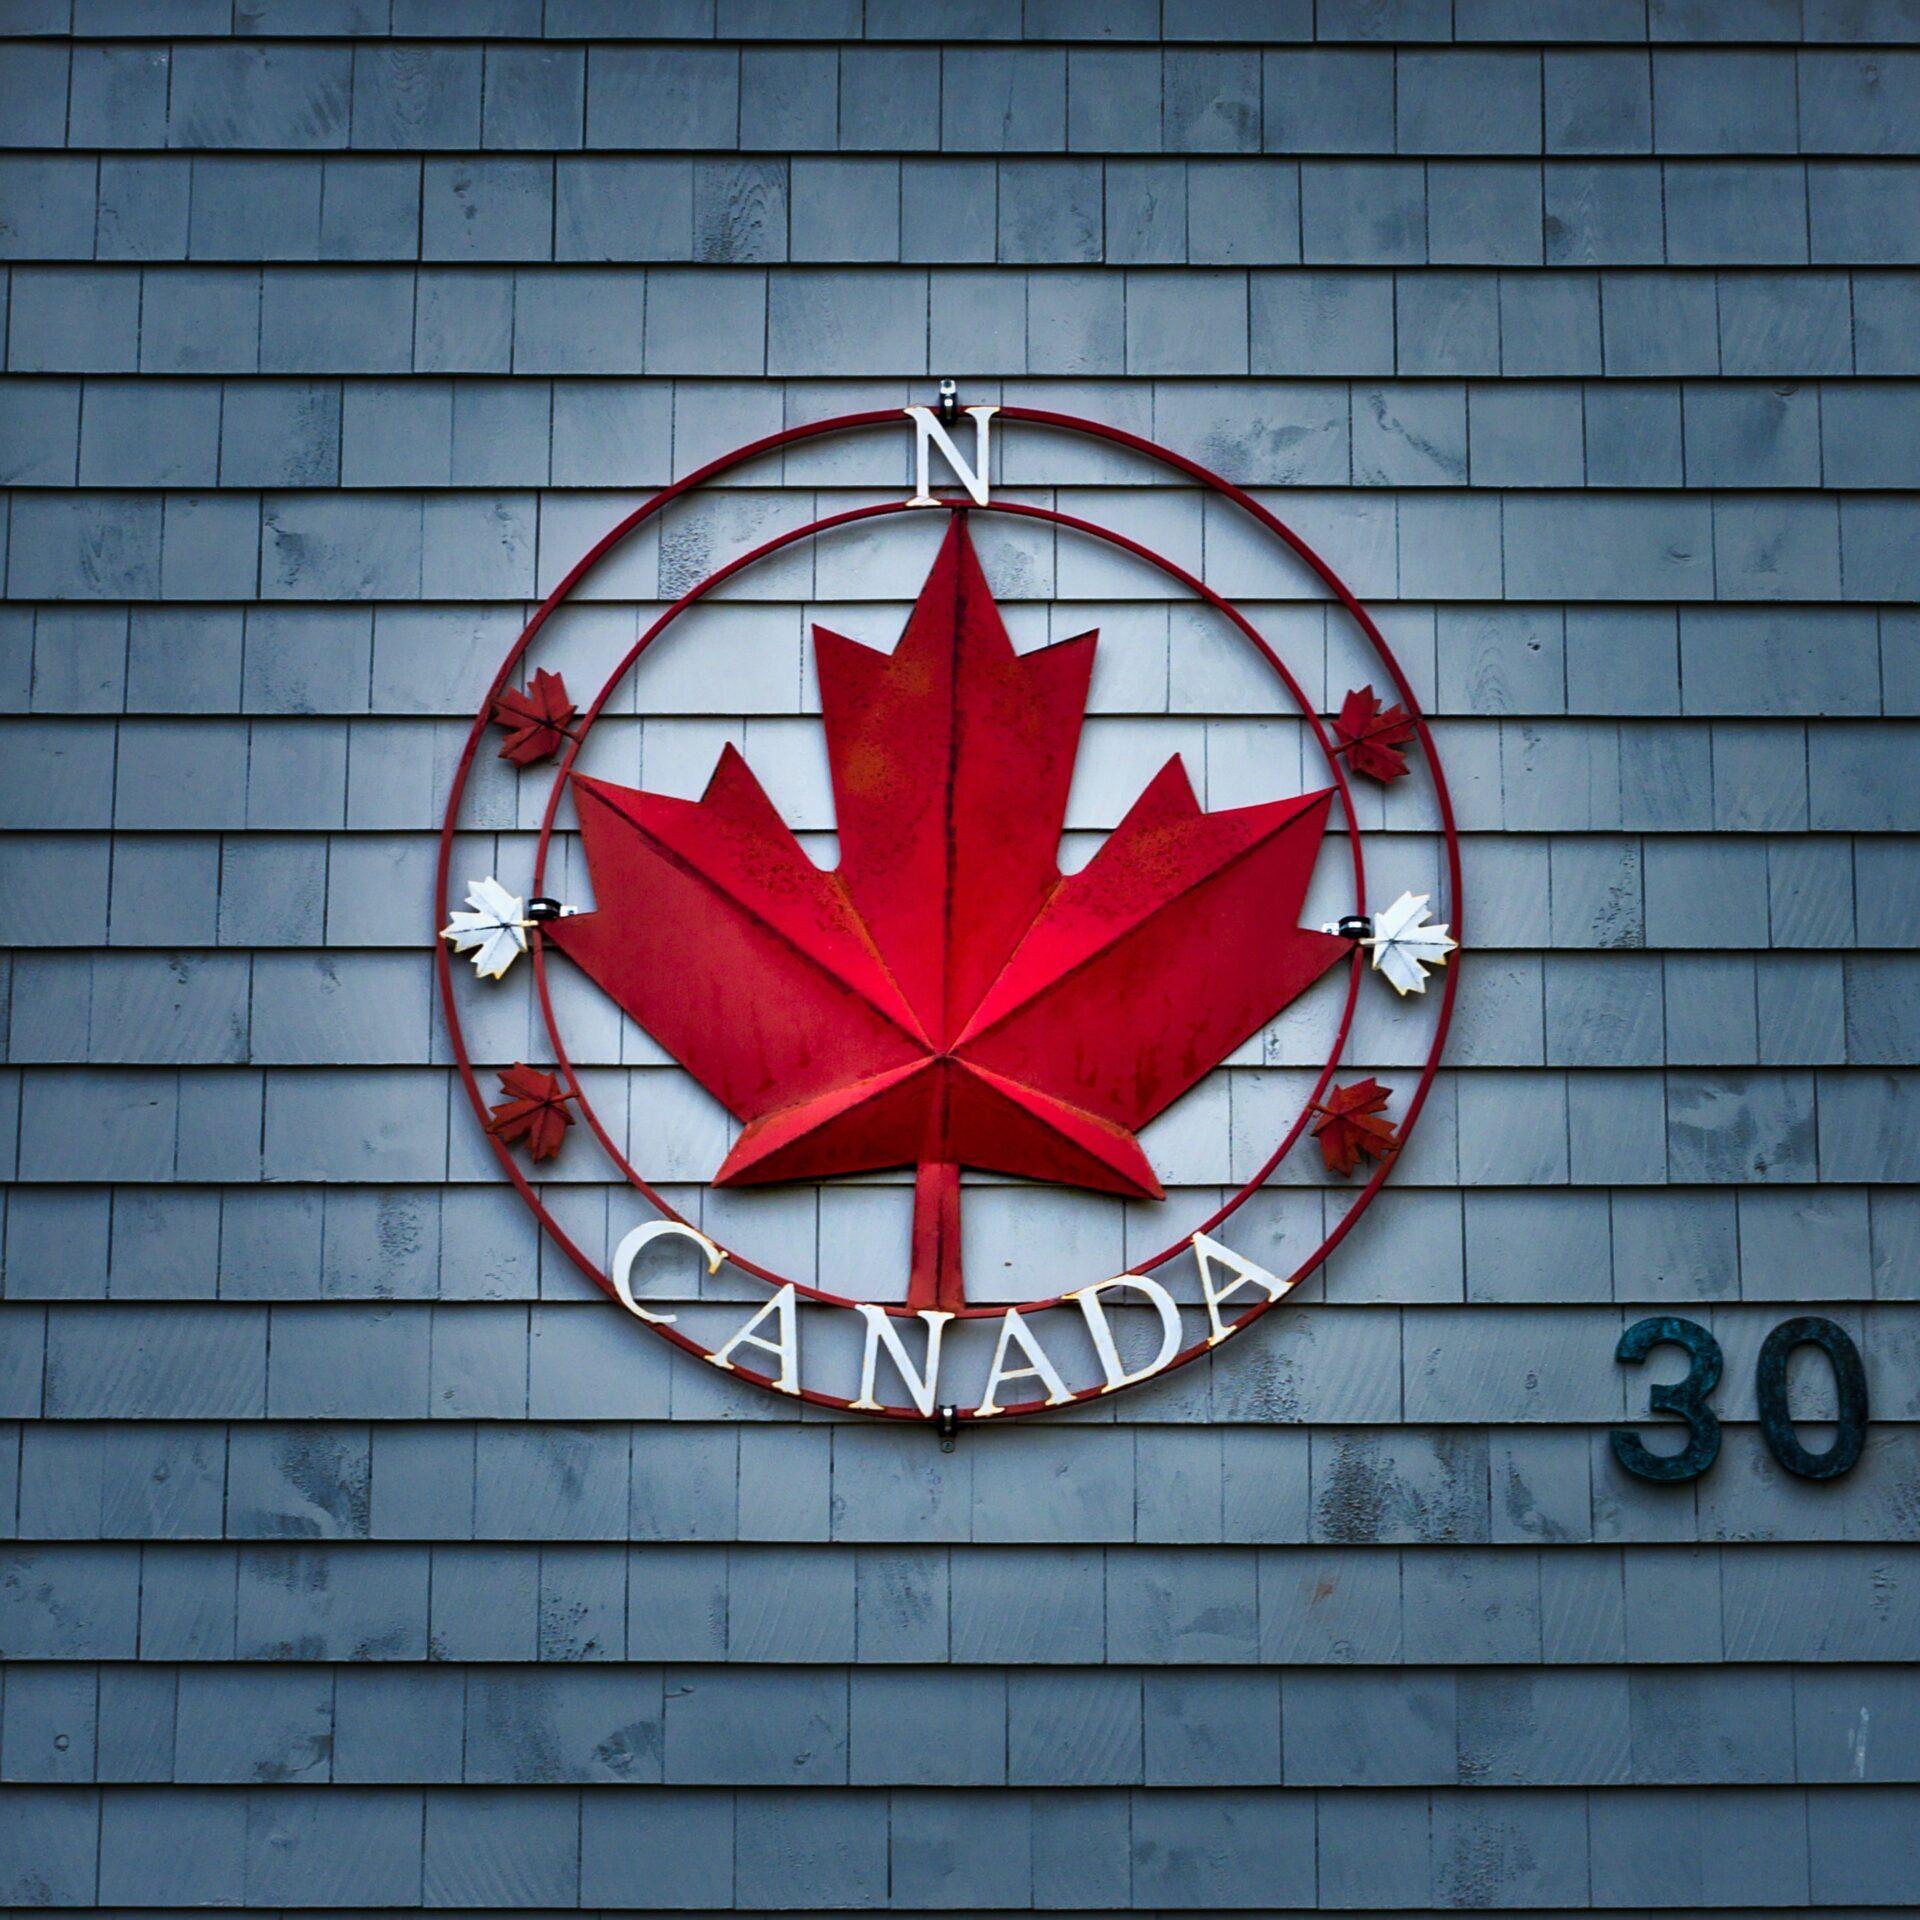 W|PEC: LNG Canada Q321 Project Update